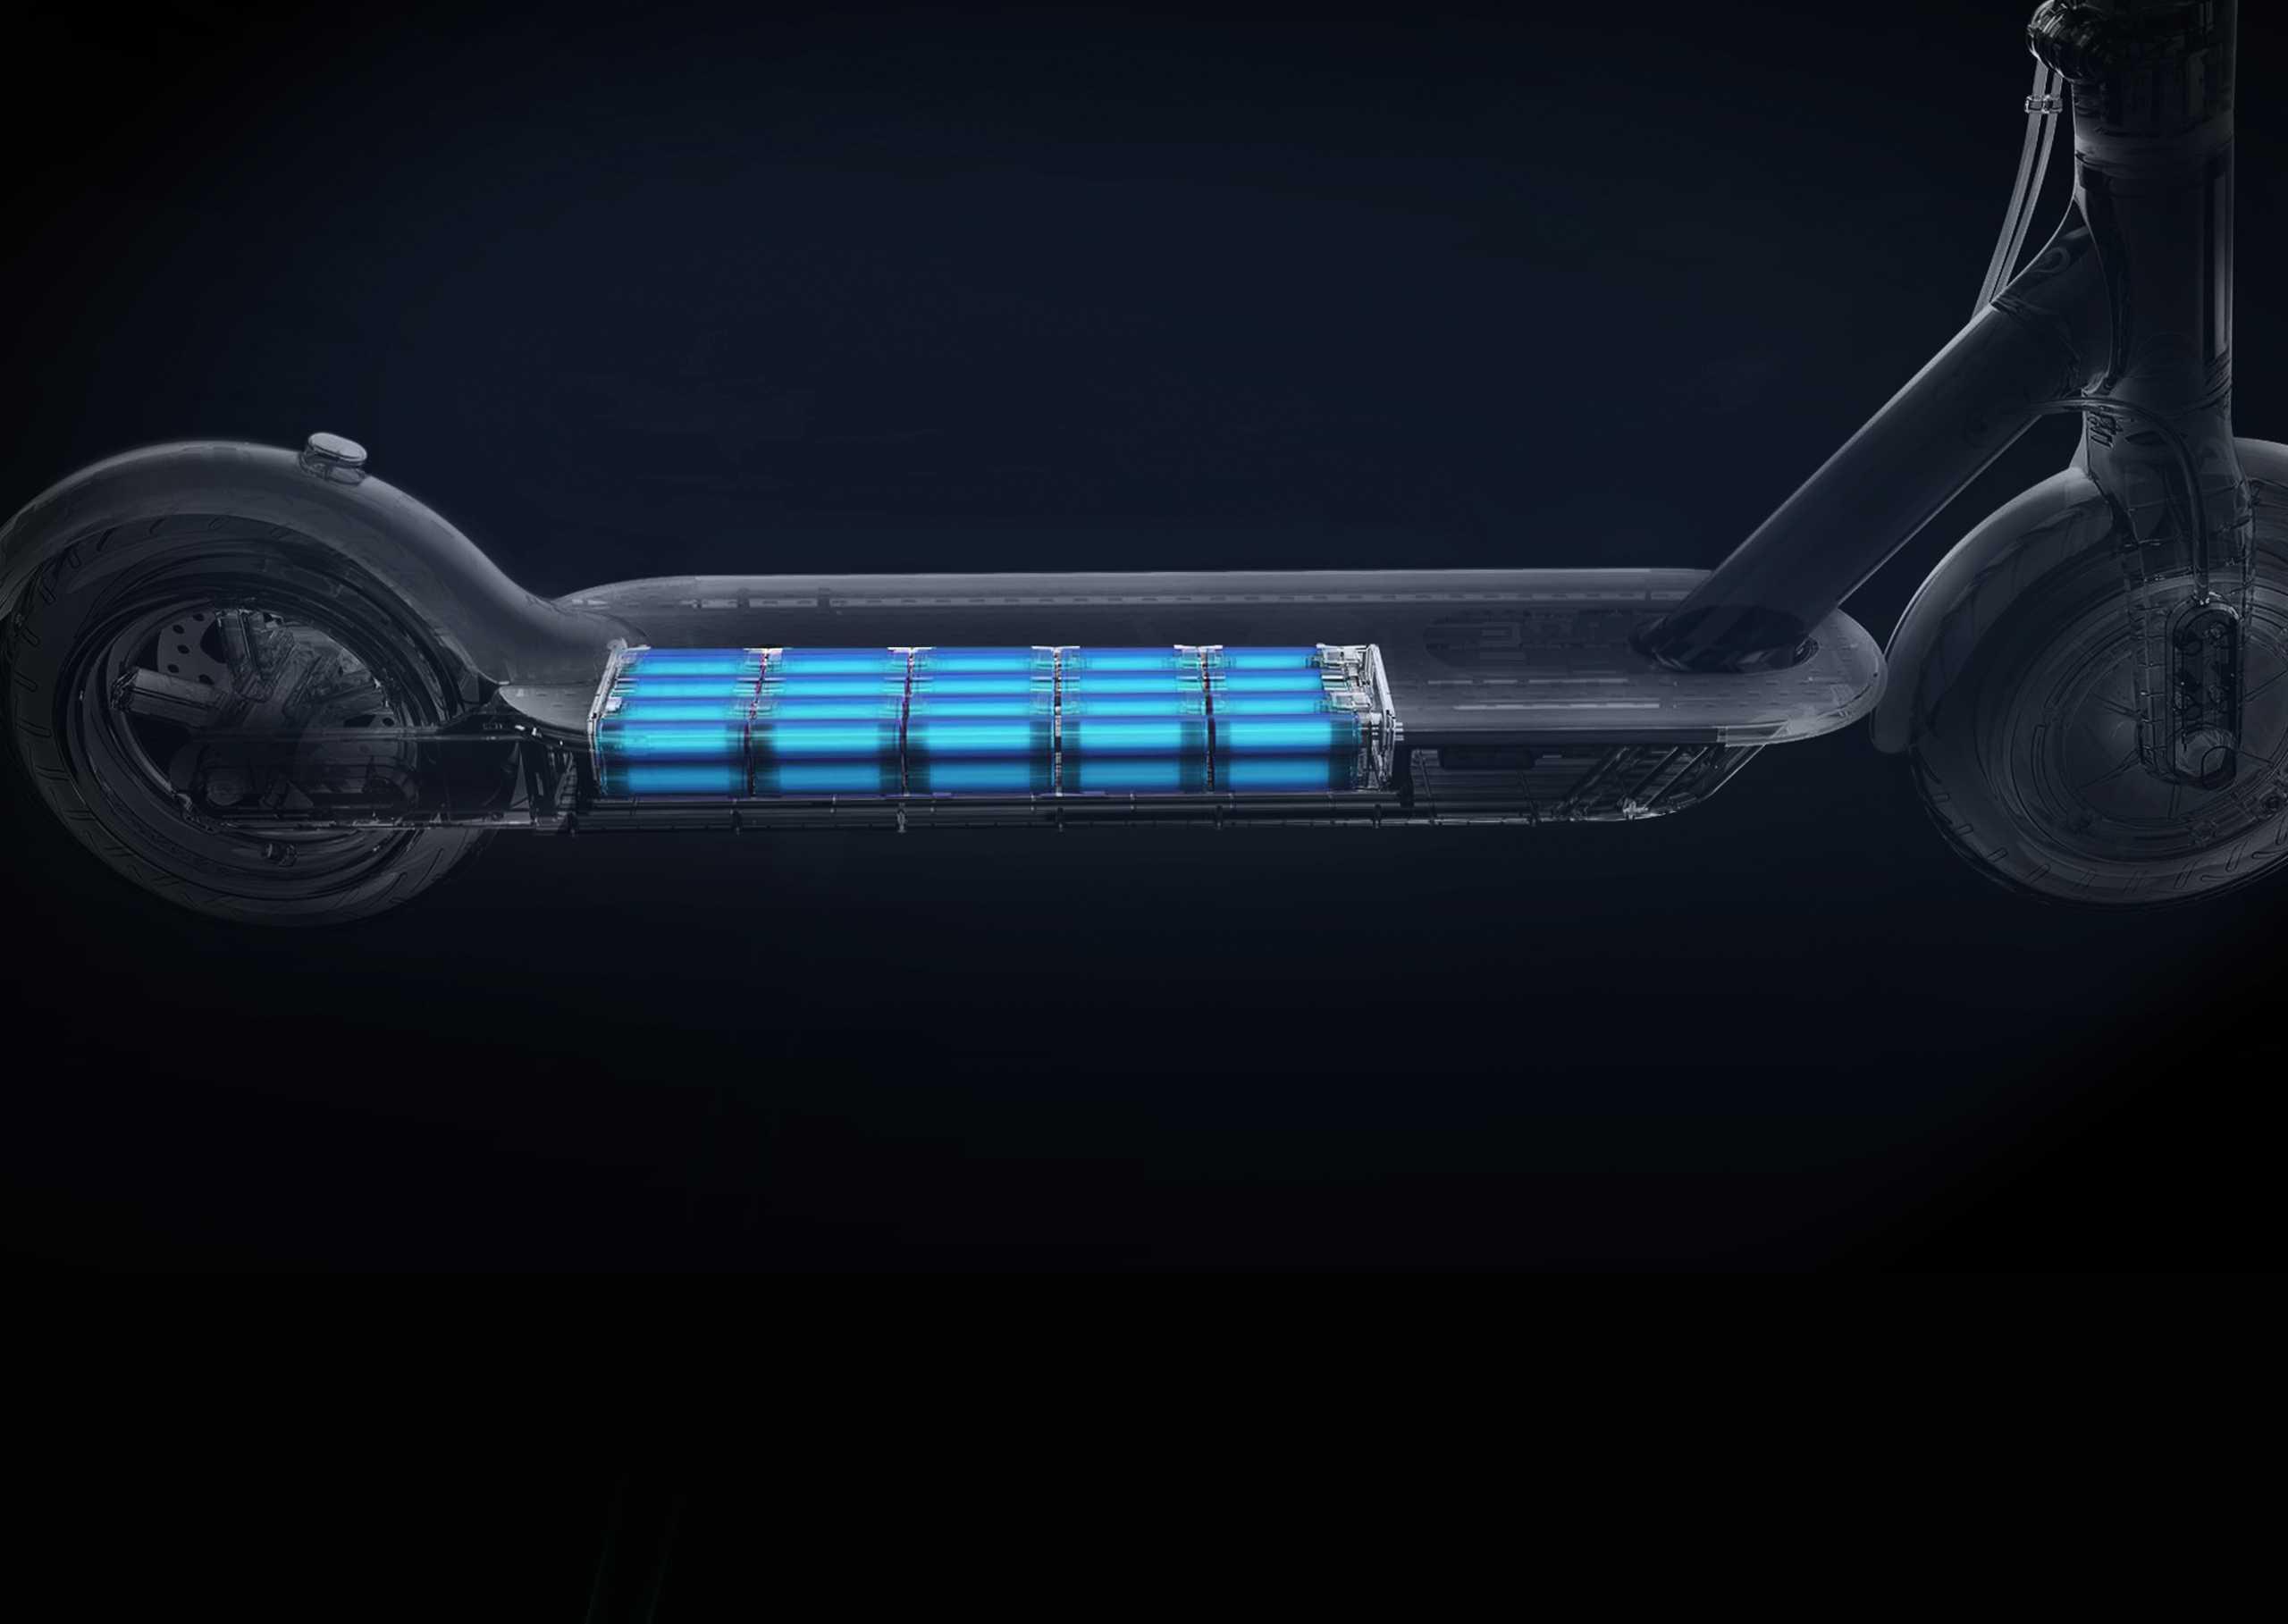 Mi Electric Scooter Pro / M365 Pro